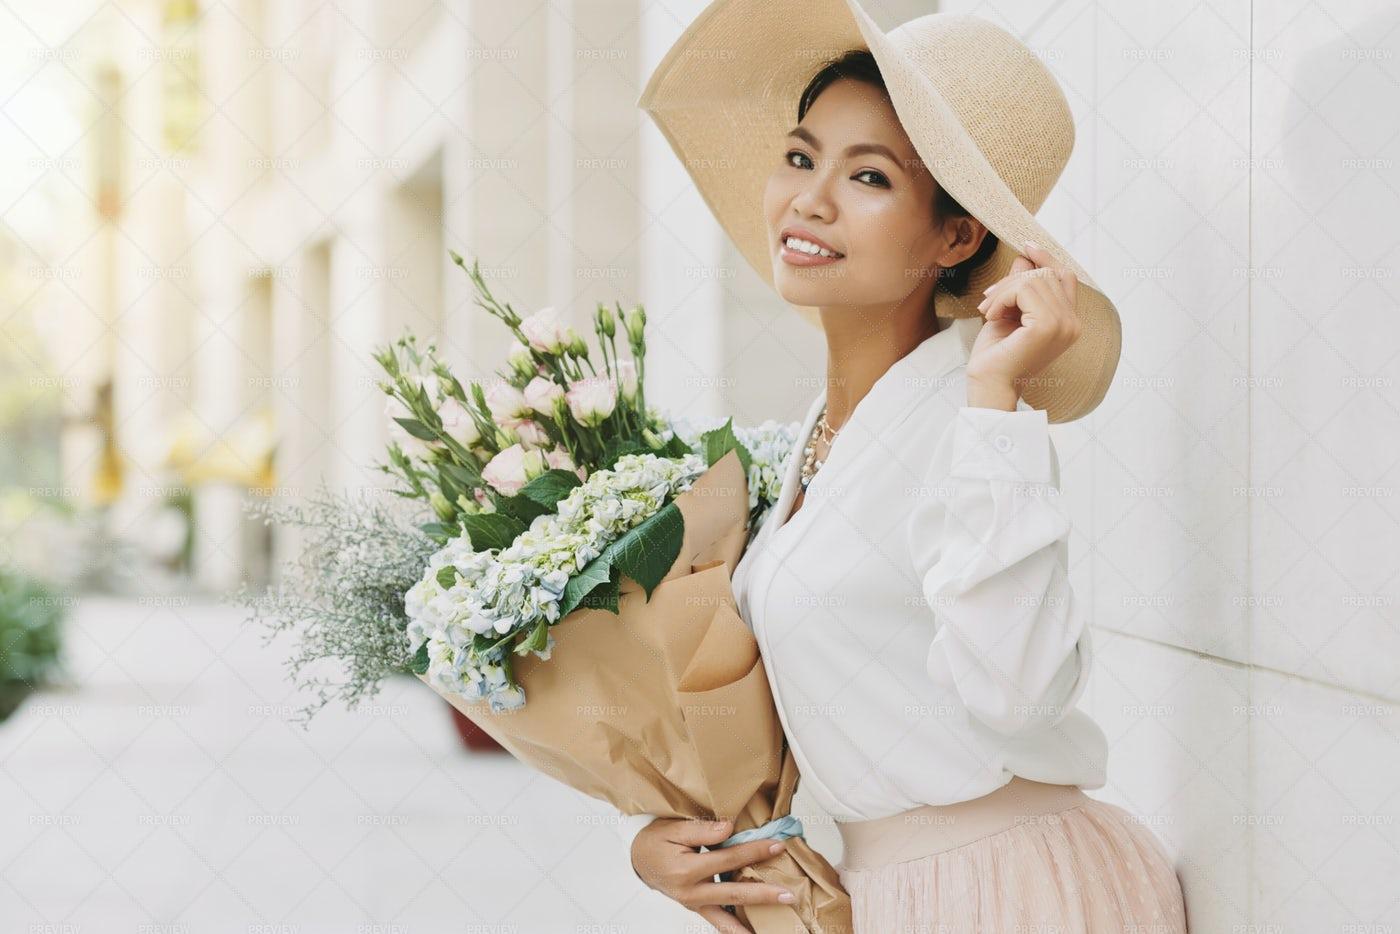 Posing With Flowers: Stock Photos